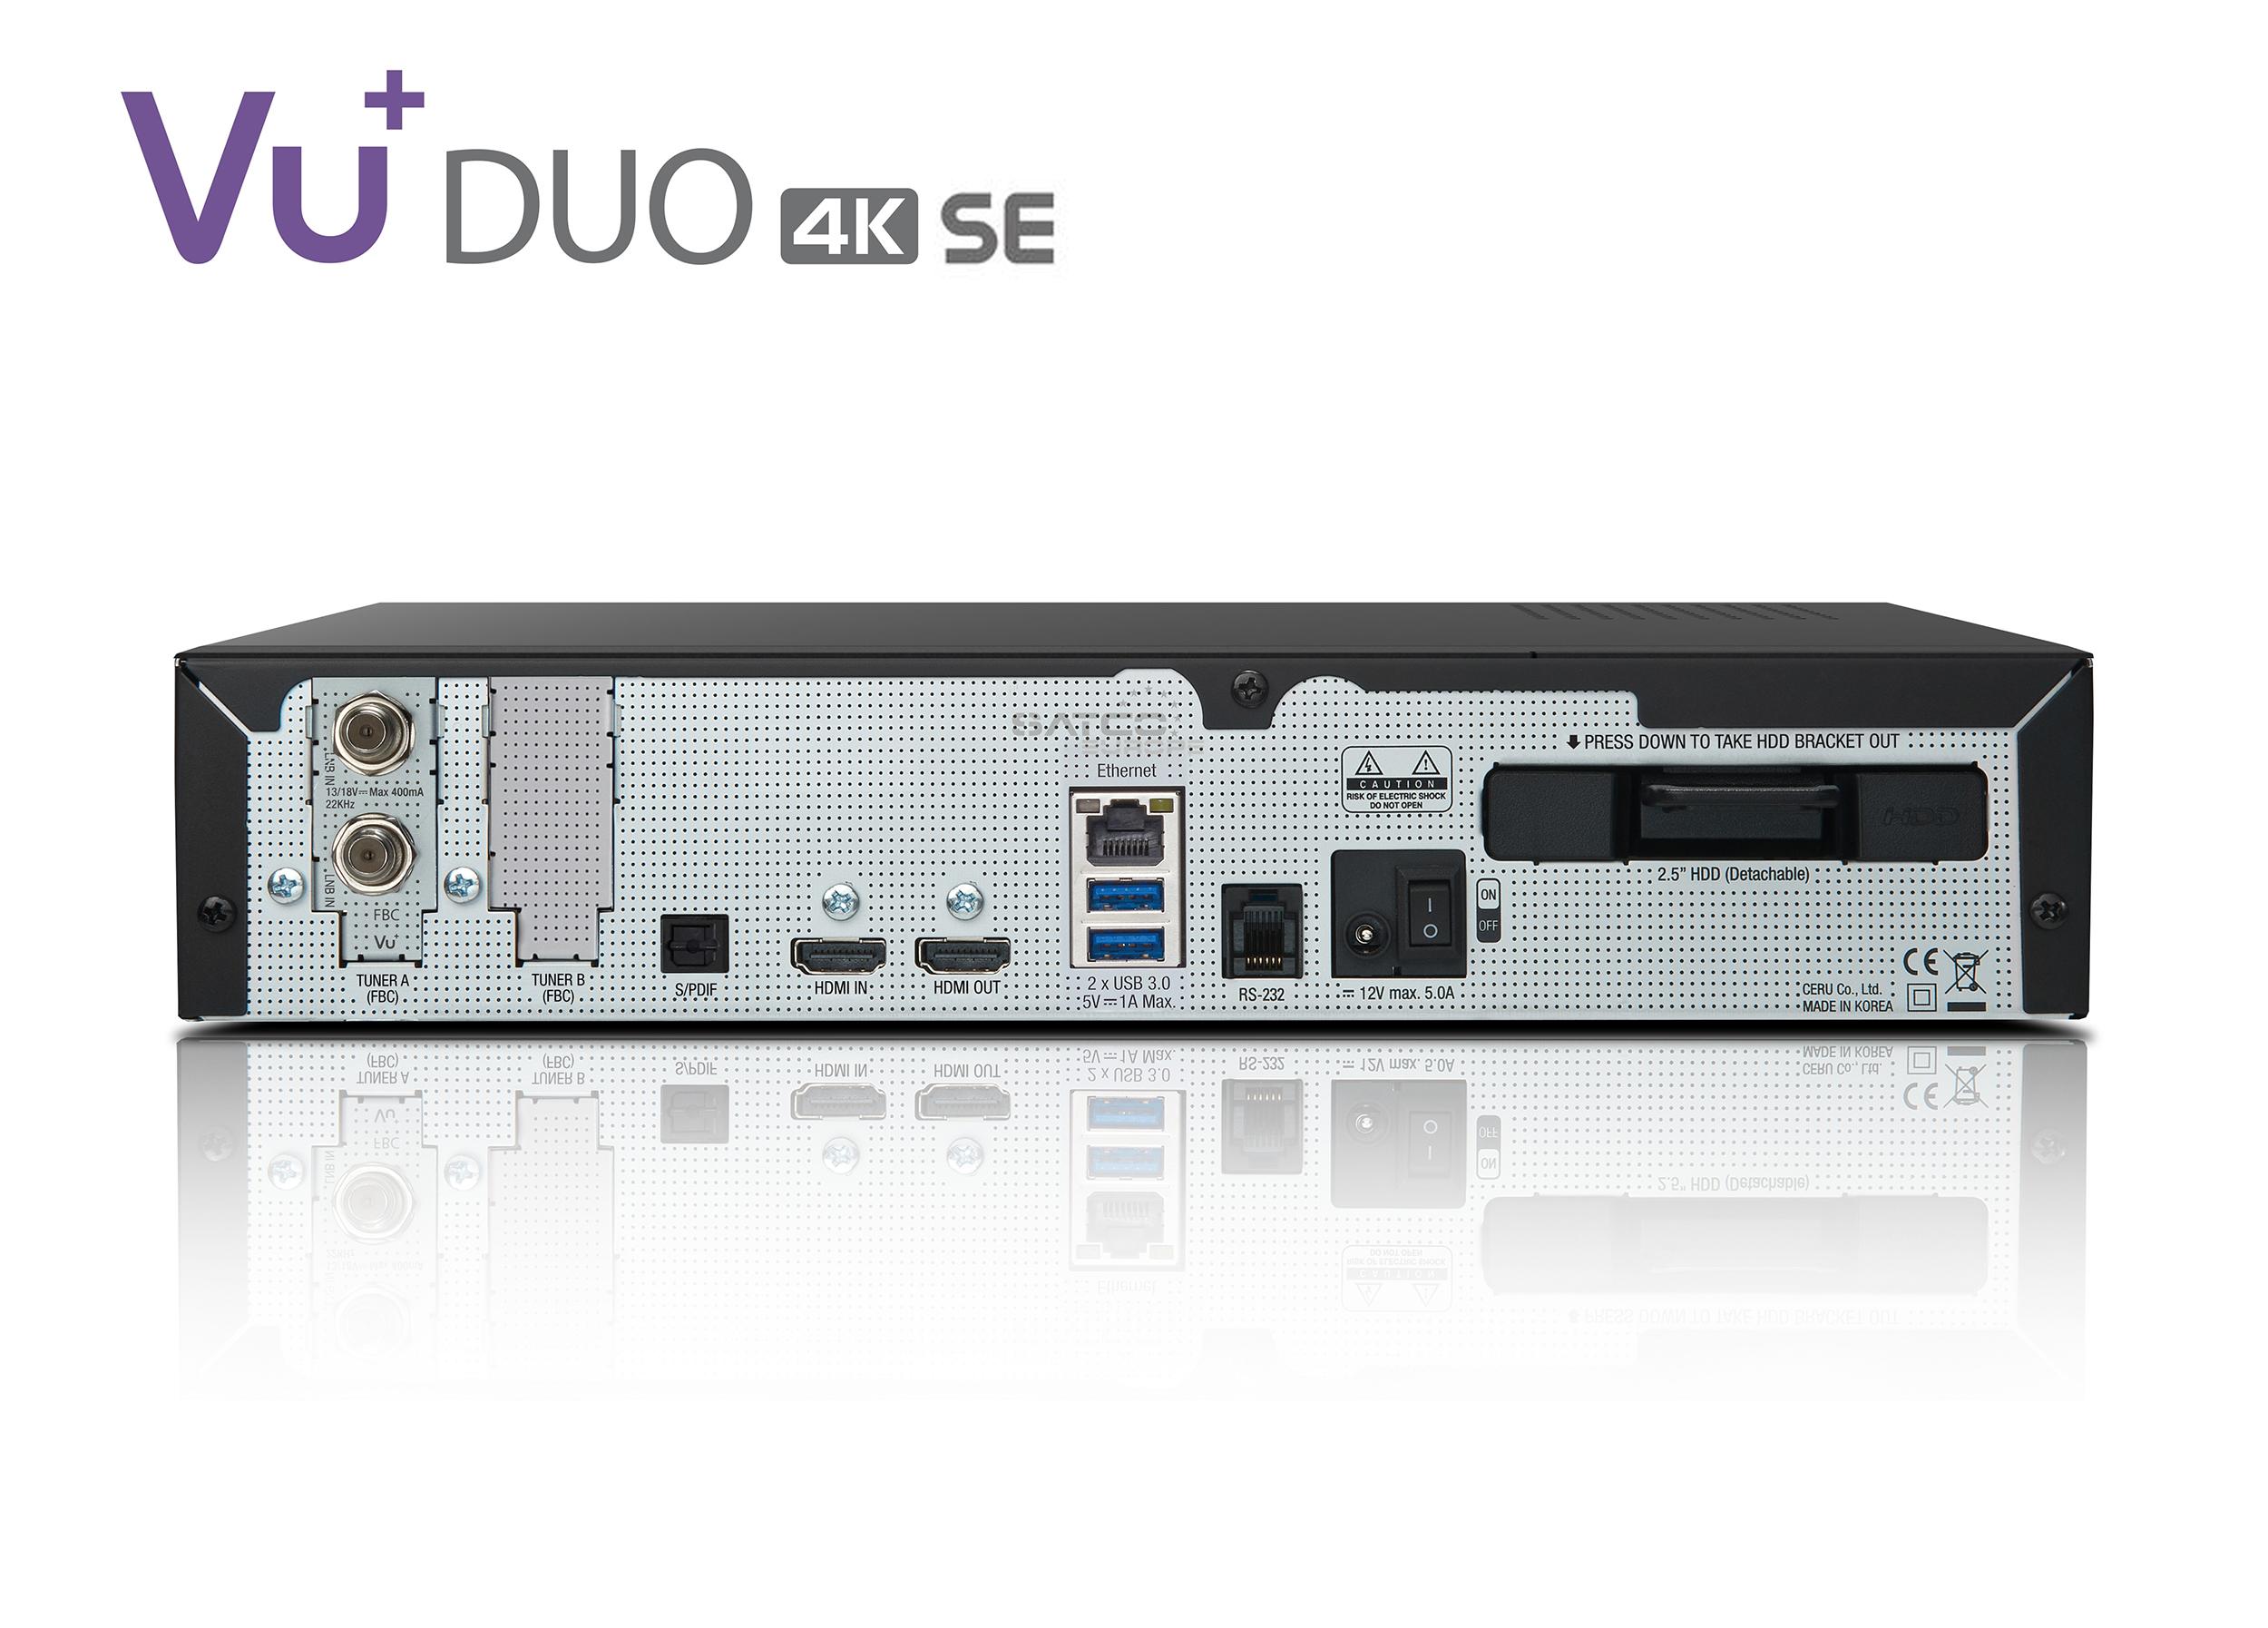 VU+ Duo 4K SE BT 1x DVB-S2X FBC Twin Tuner PVR ready Linux Receiver UHD 2160p